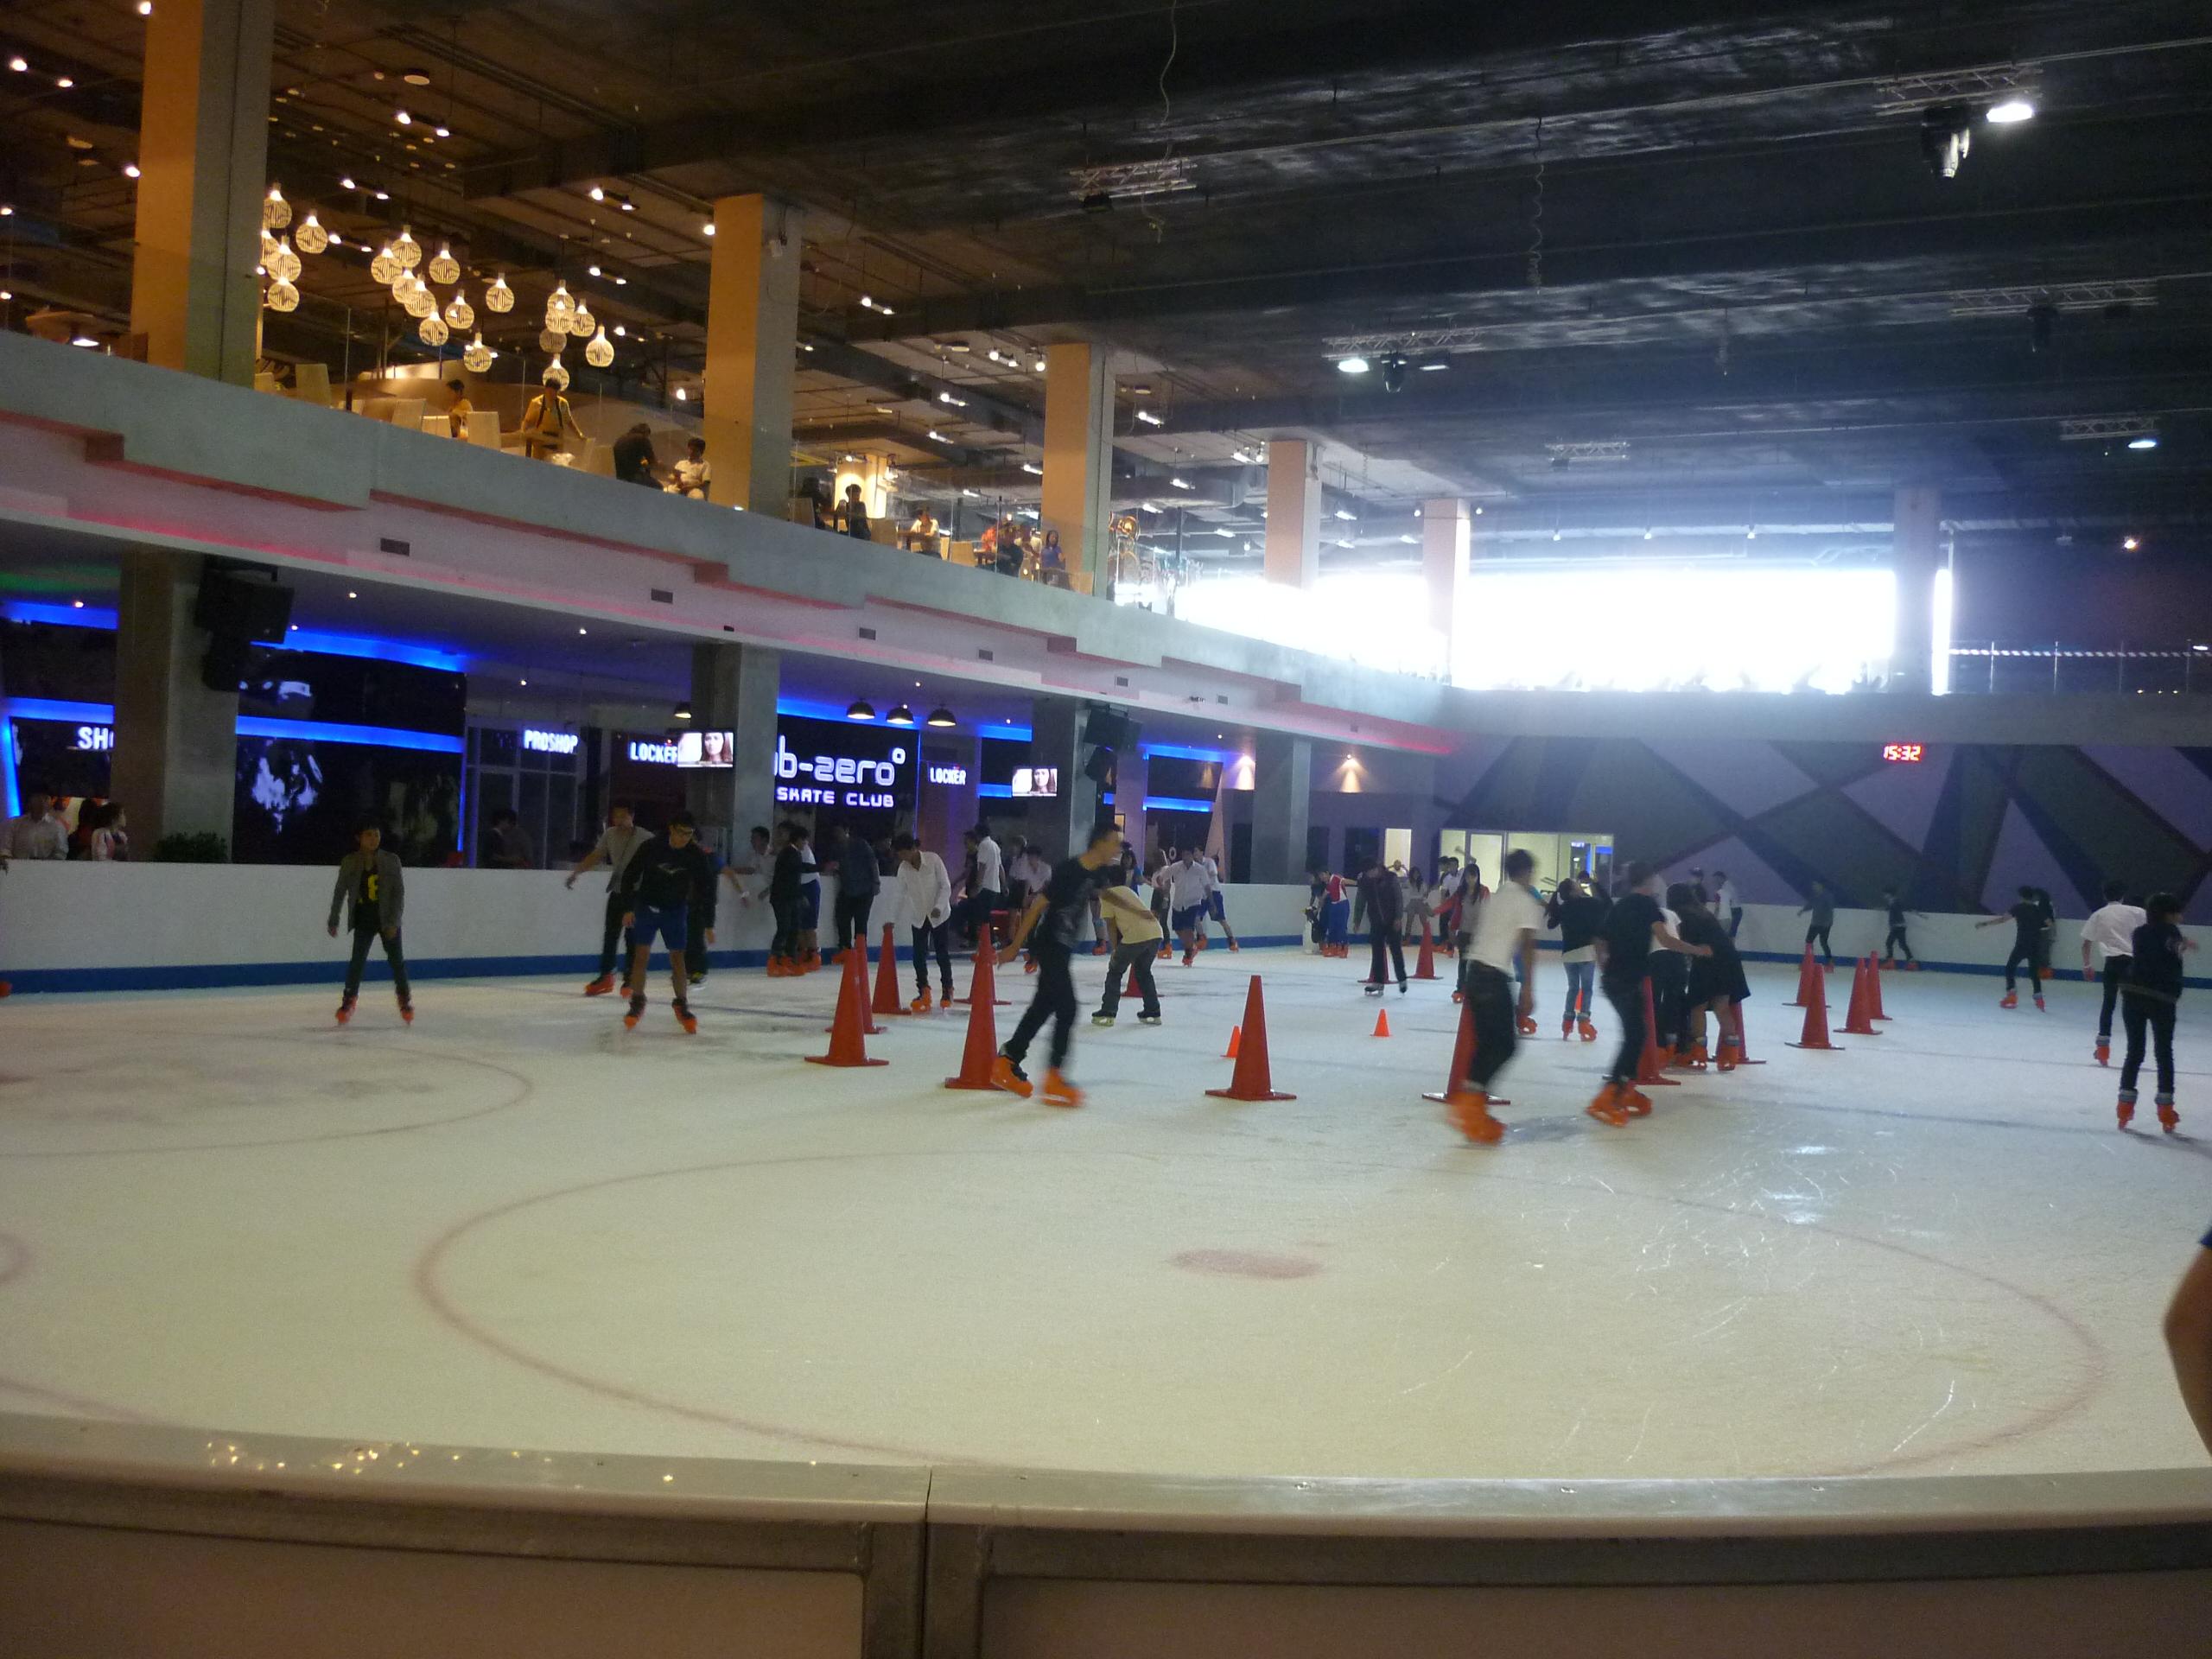 Sub-Zero Ice Skate Club